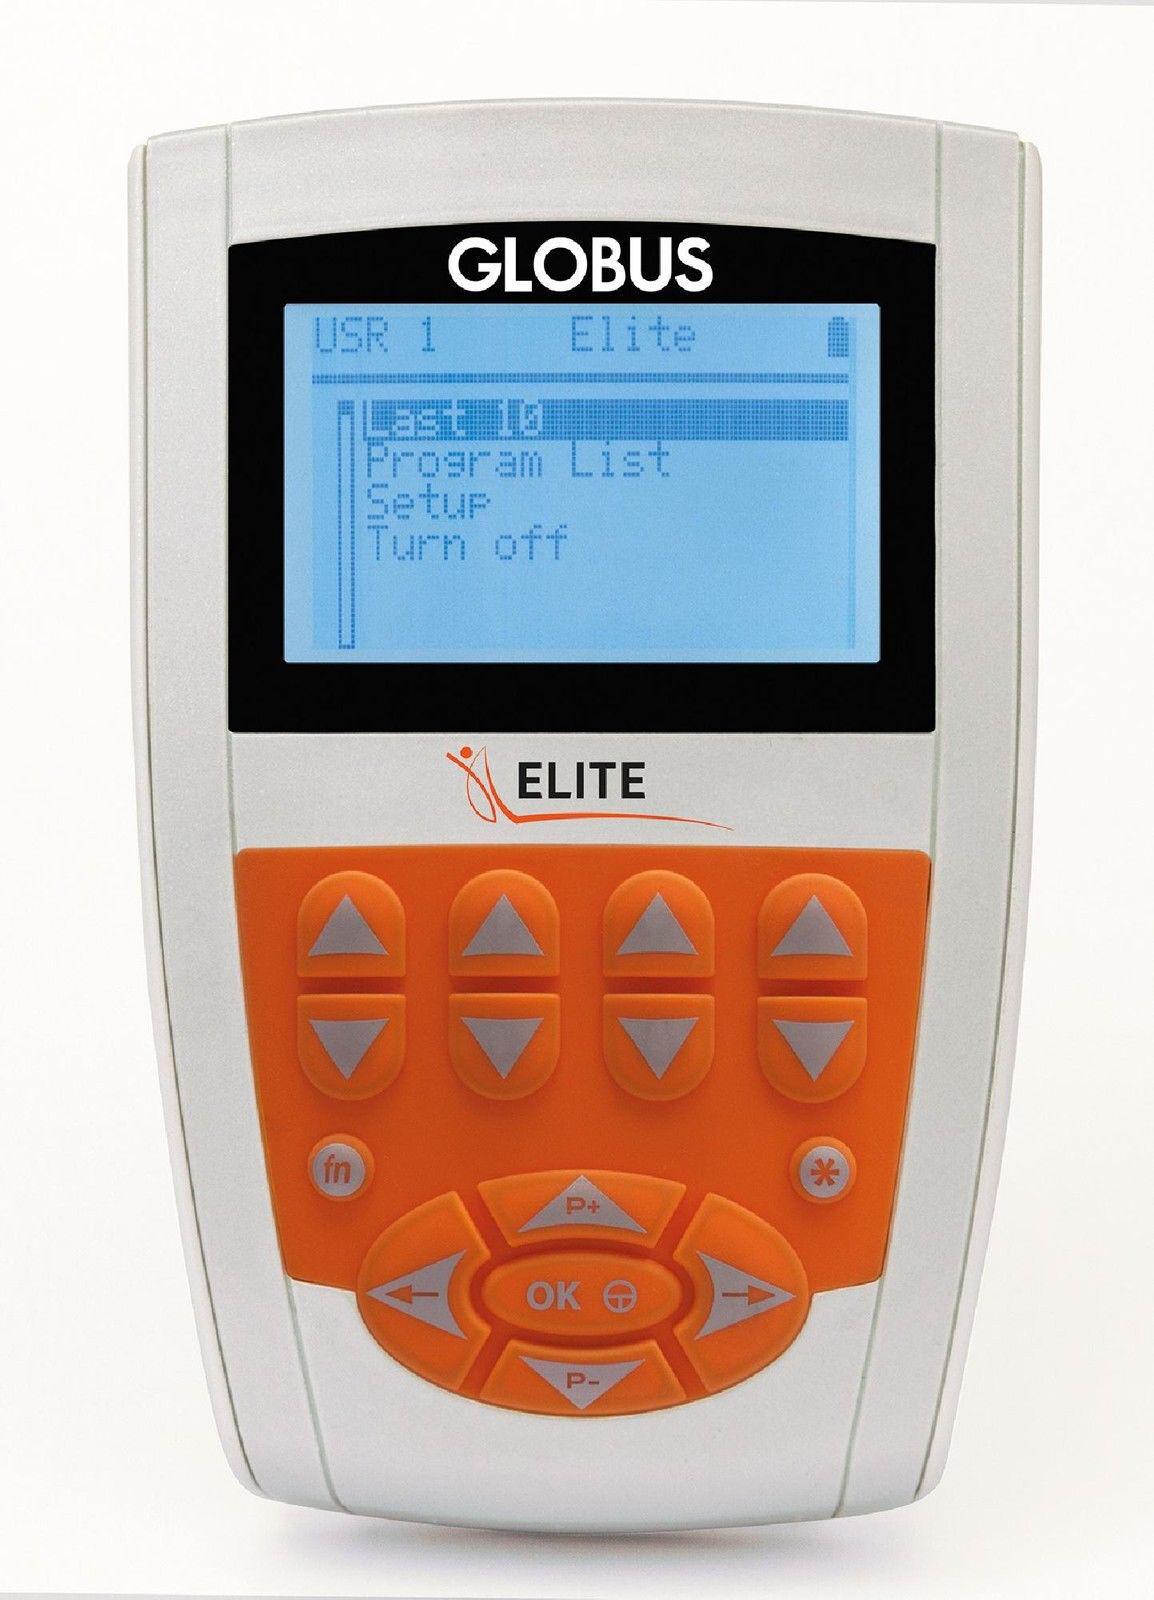 Globus ELITE elettrostimolatore Sport Fitness Estetica Tens Riabilitaz 98 PROG